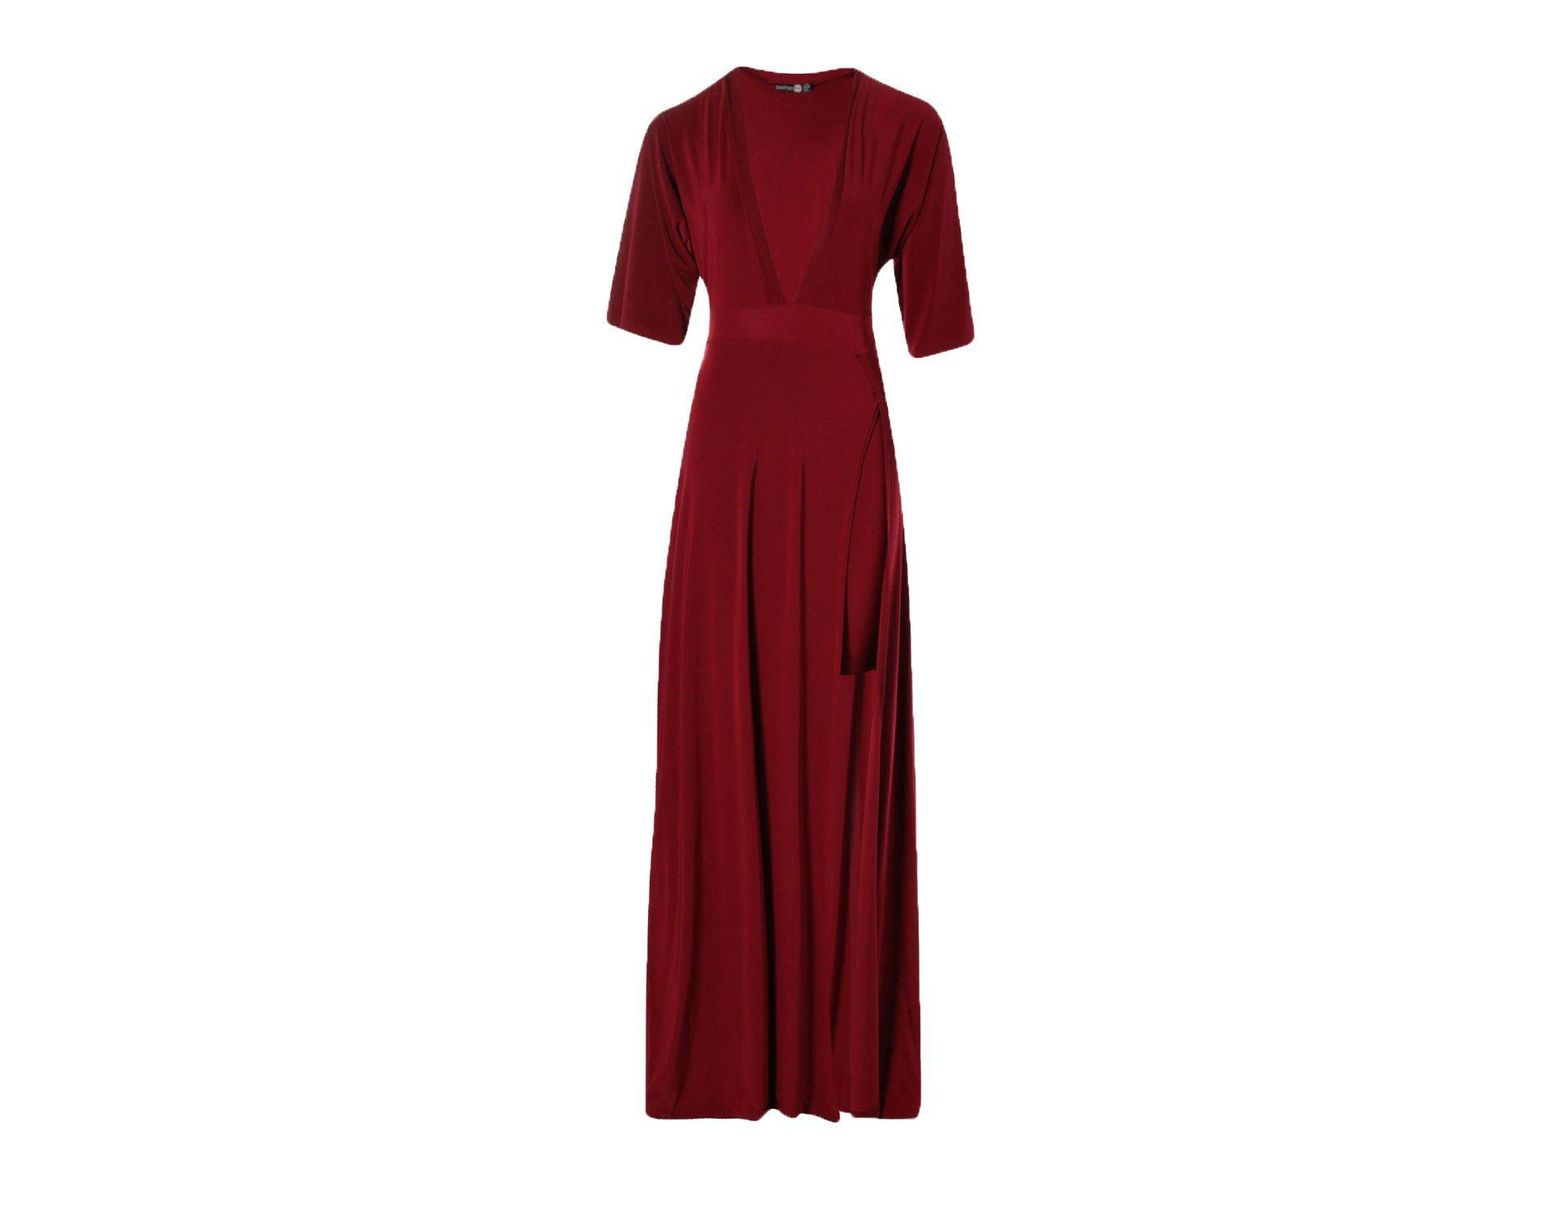 637c4cf41306 Boohoo Slinky Plunge Kimono Sleeve Maxi Dress in Natural - Lyst